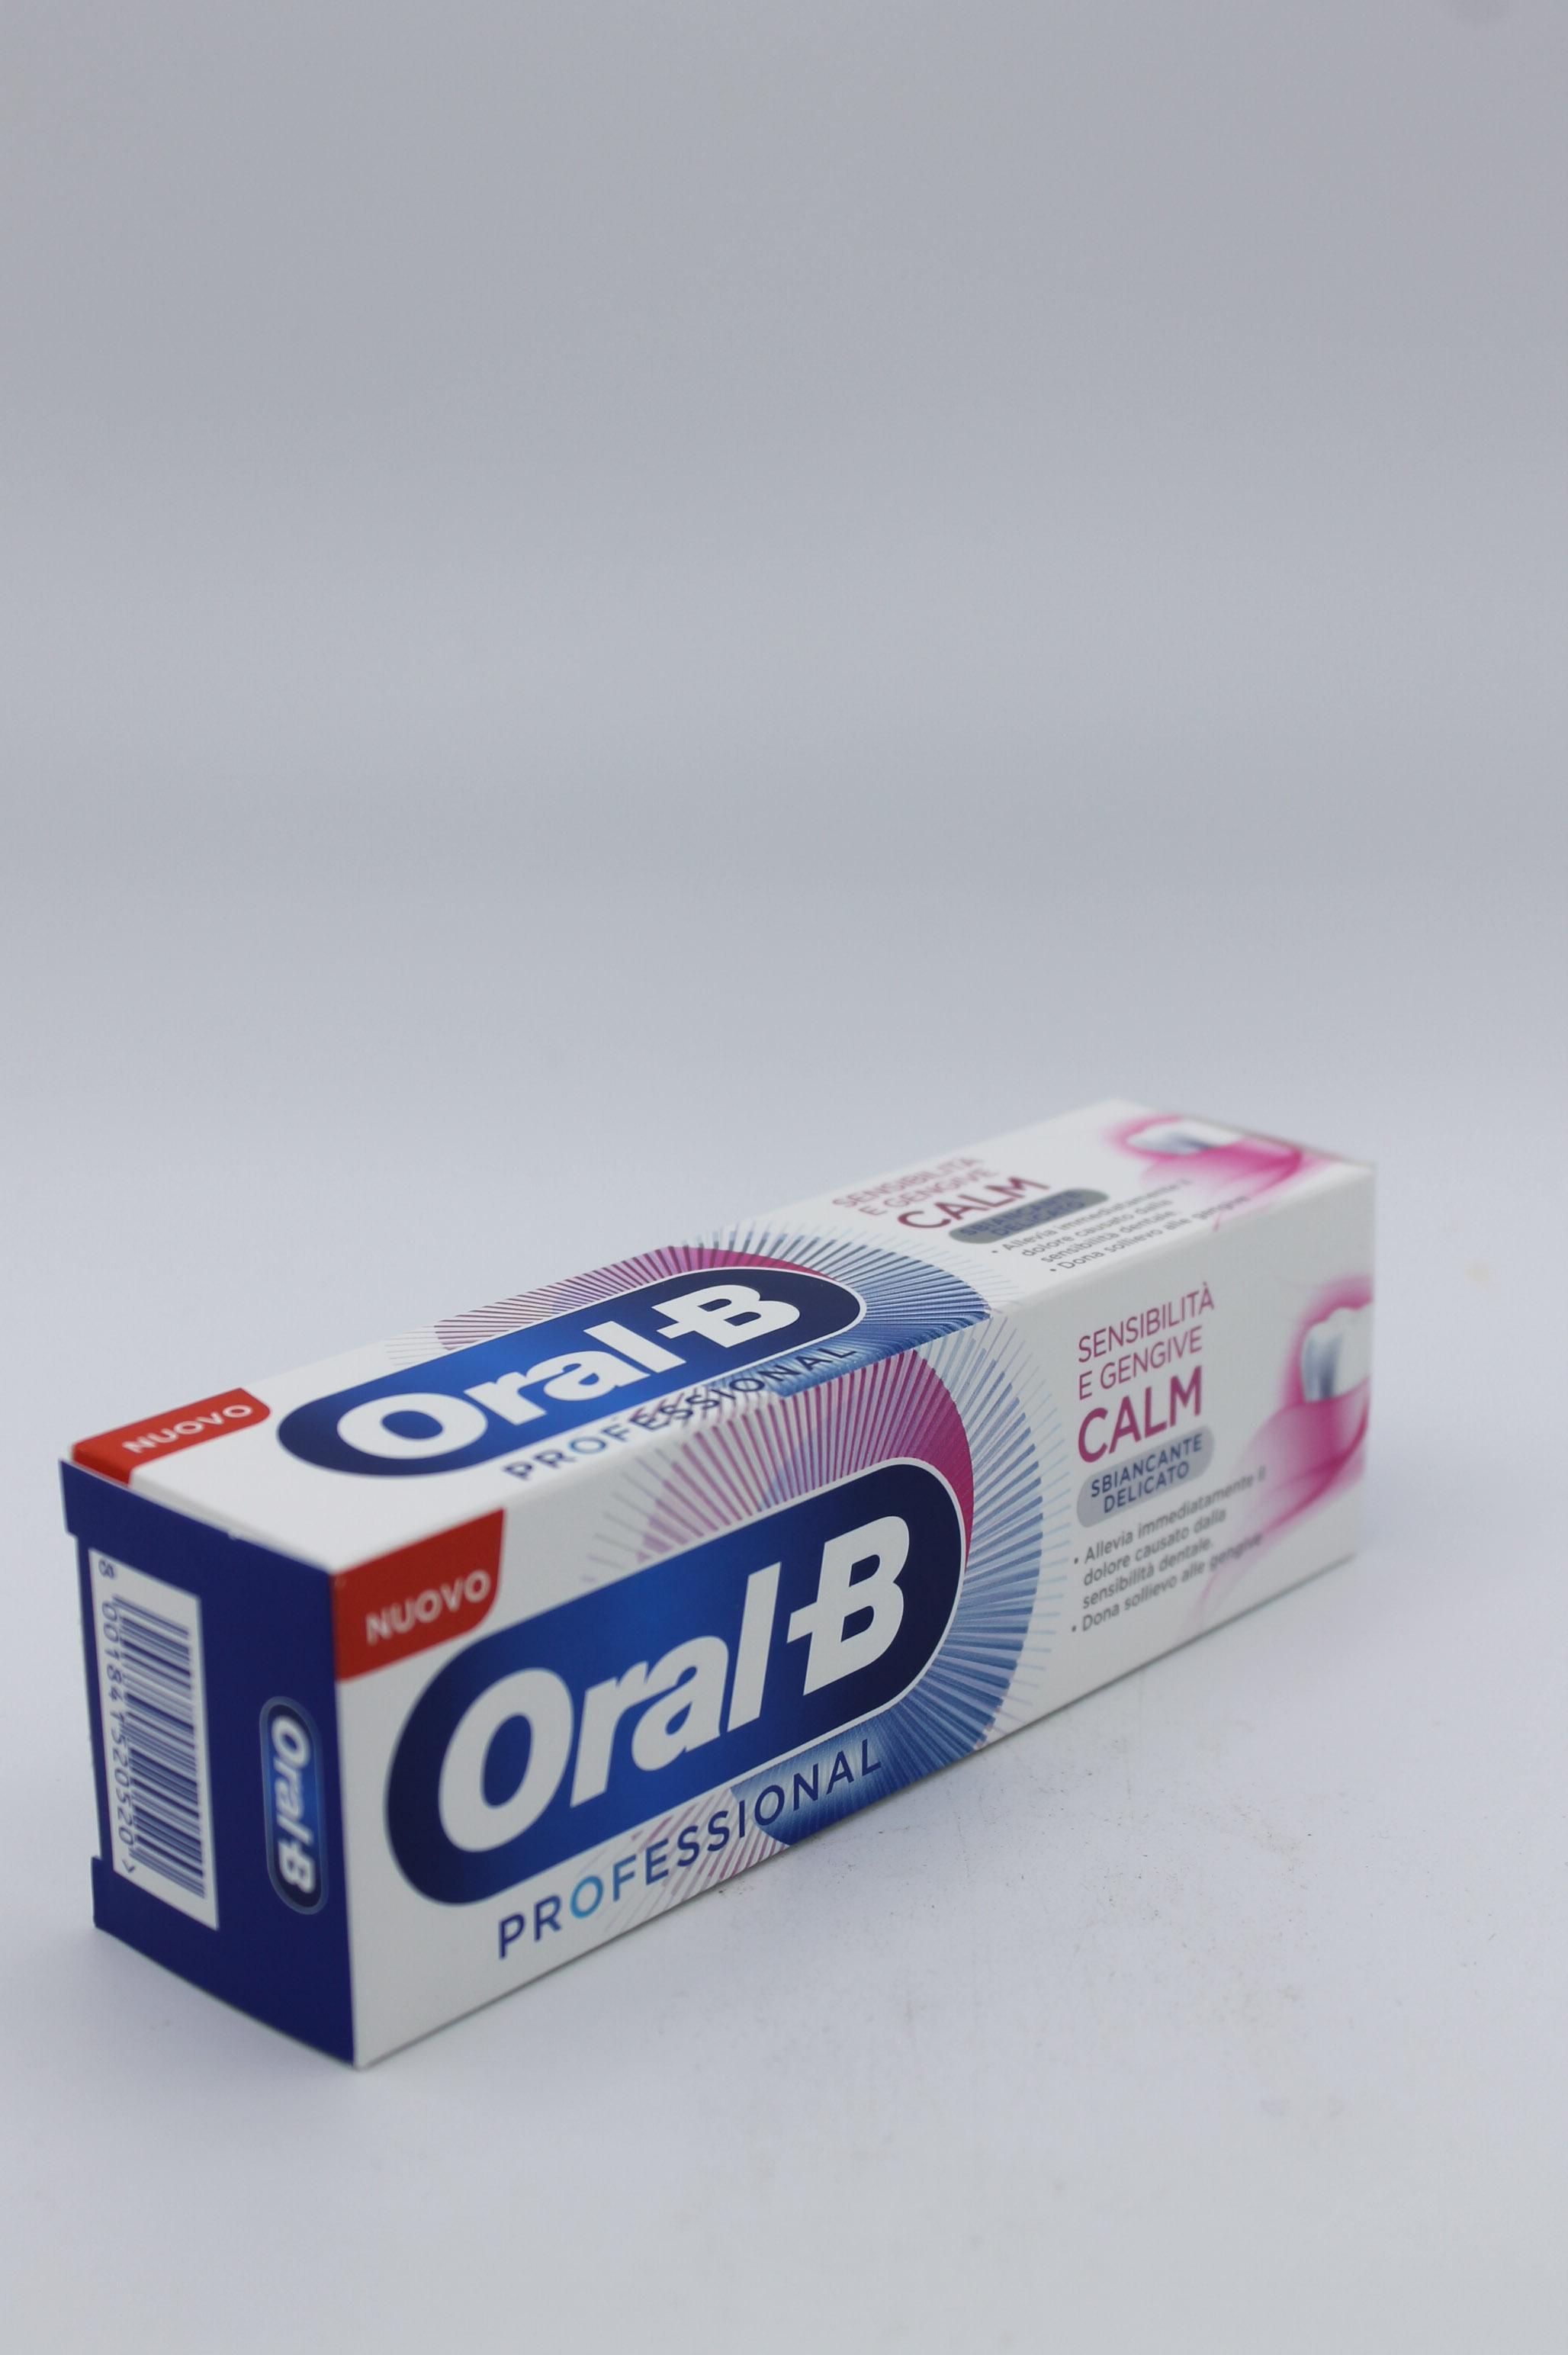 Oral B dentifricio tubo 75ml vari tipi.